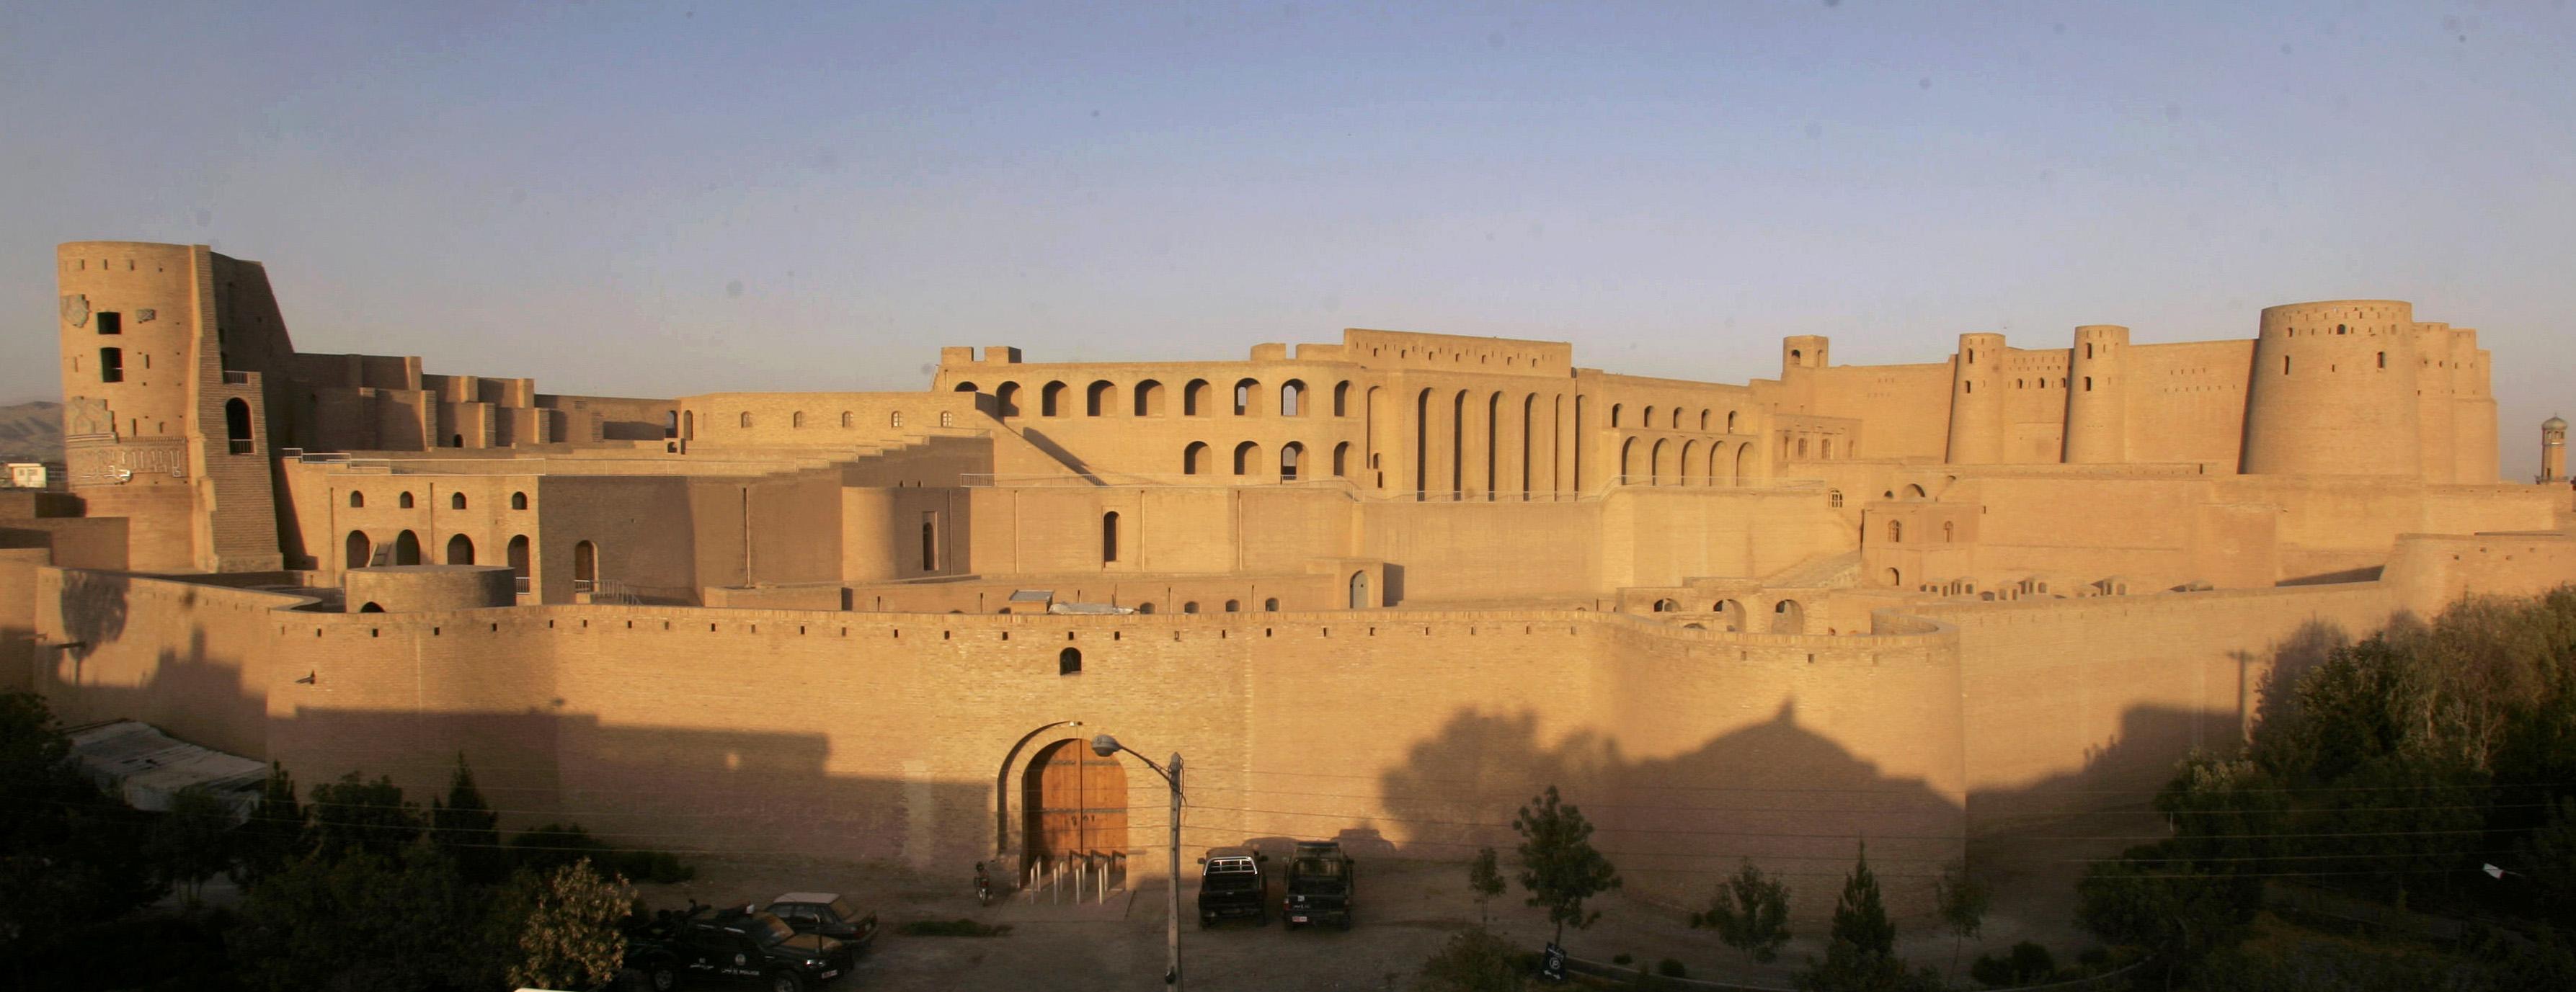 Qala-Iktyaruddin-Citadel-panorama